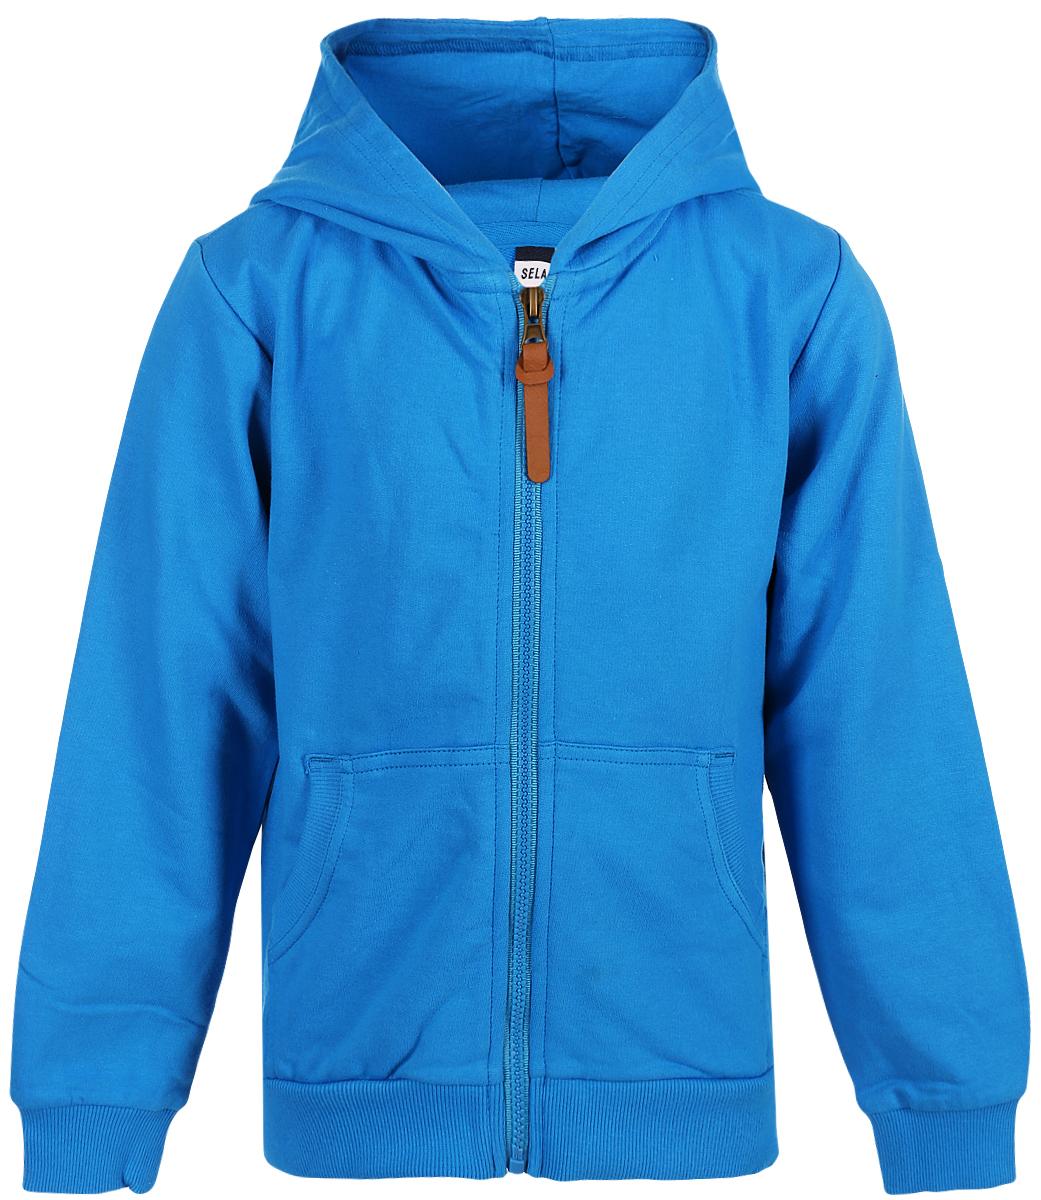 Жакет для мальчика Sela, цвет: синий. Stc-713/473-8213. Размер 116